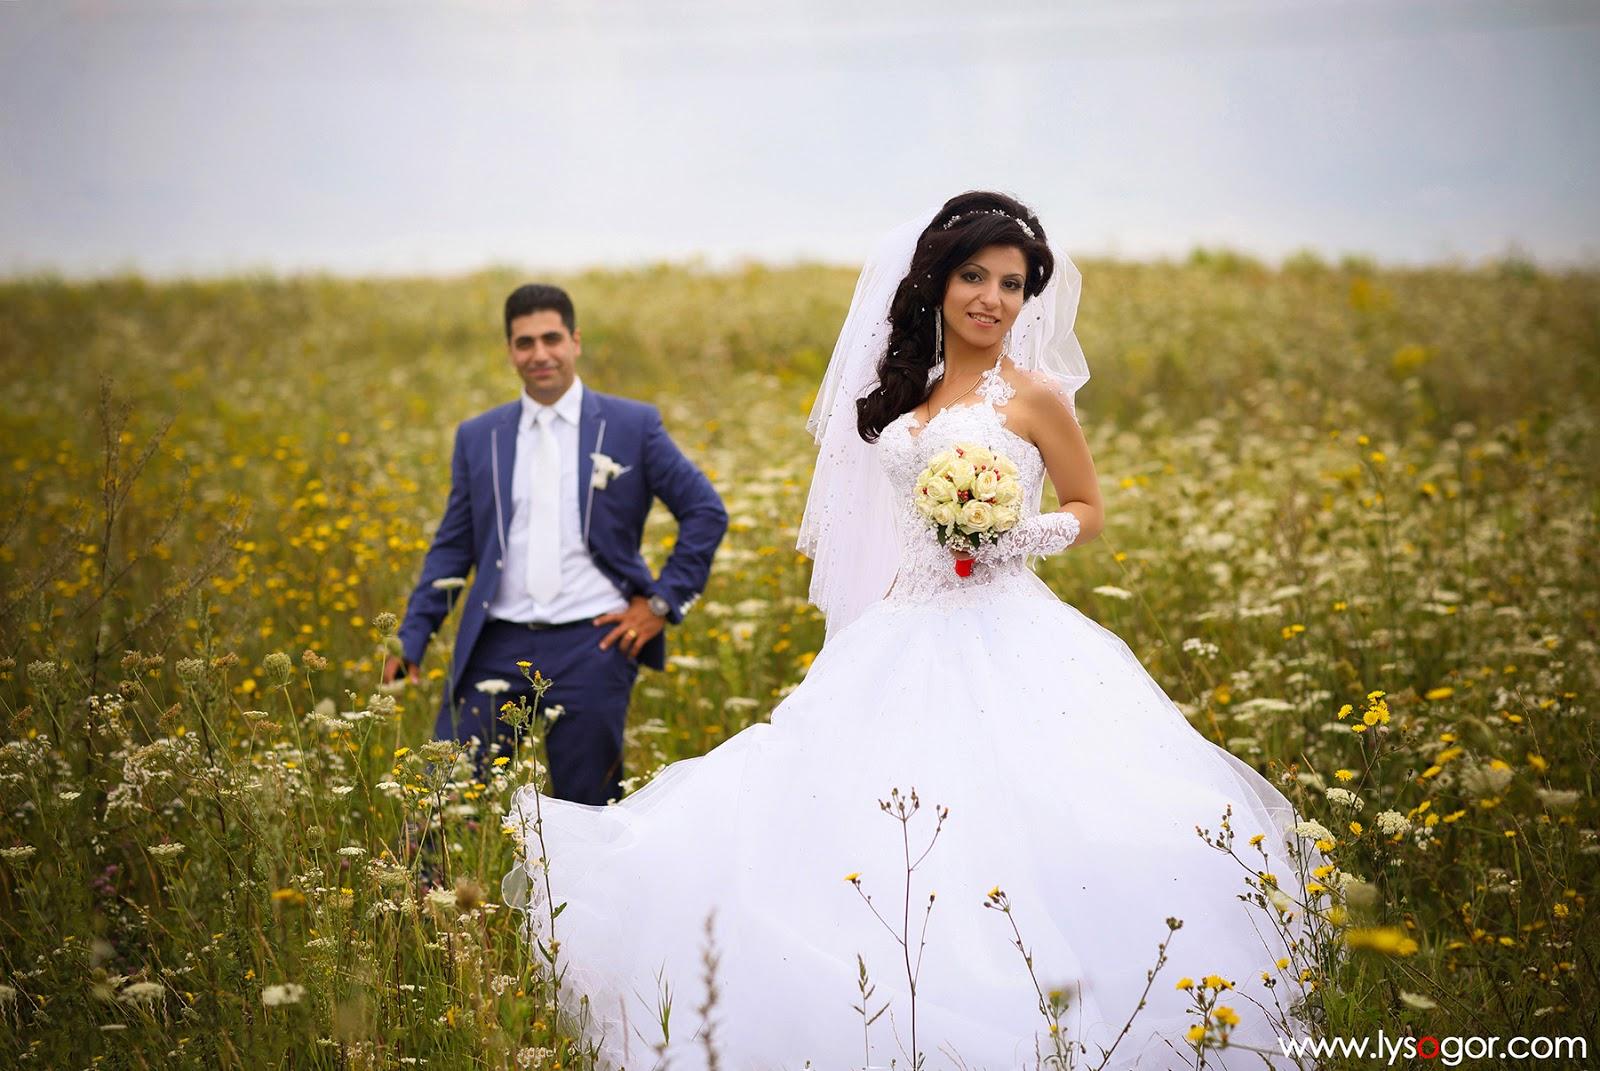 Традиции на армянской свадьбе фото